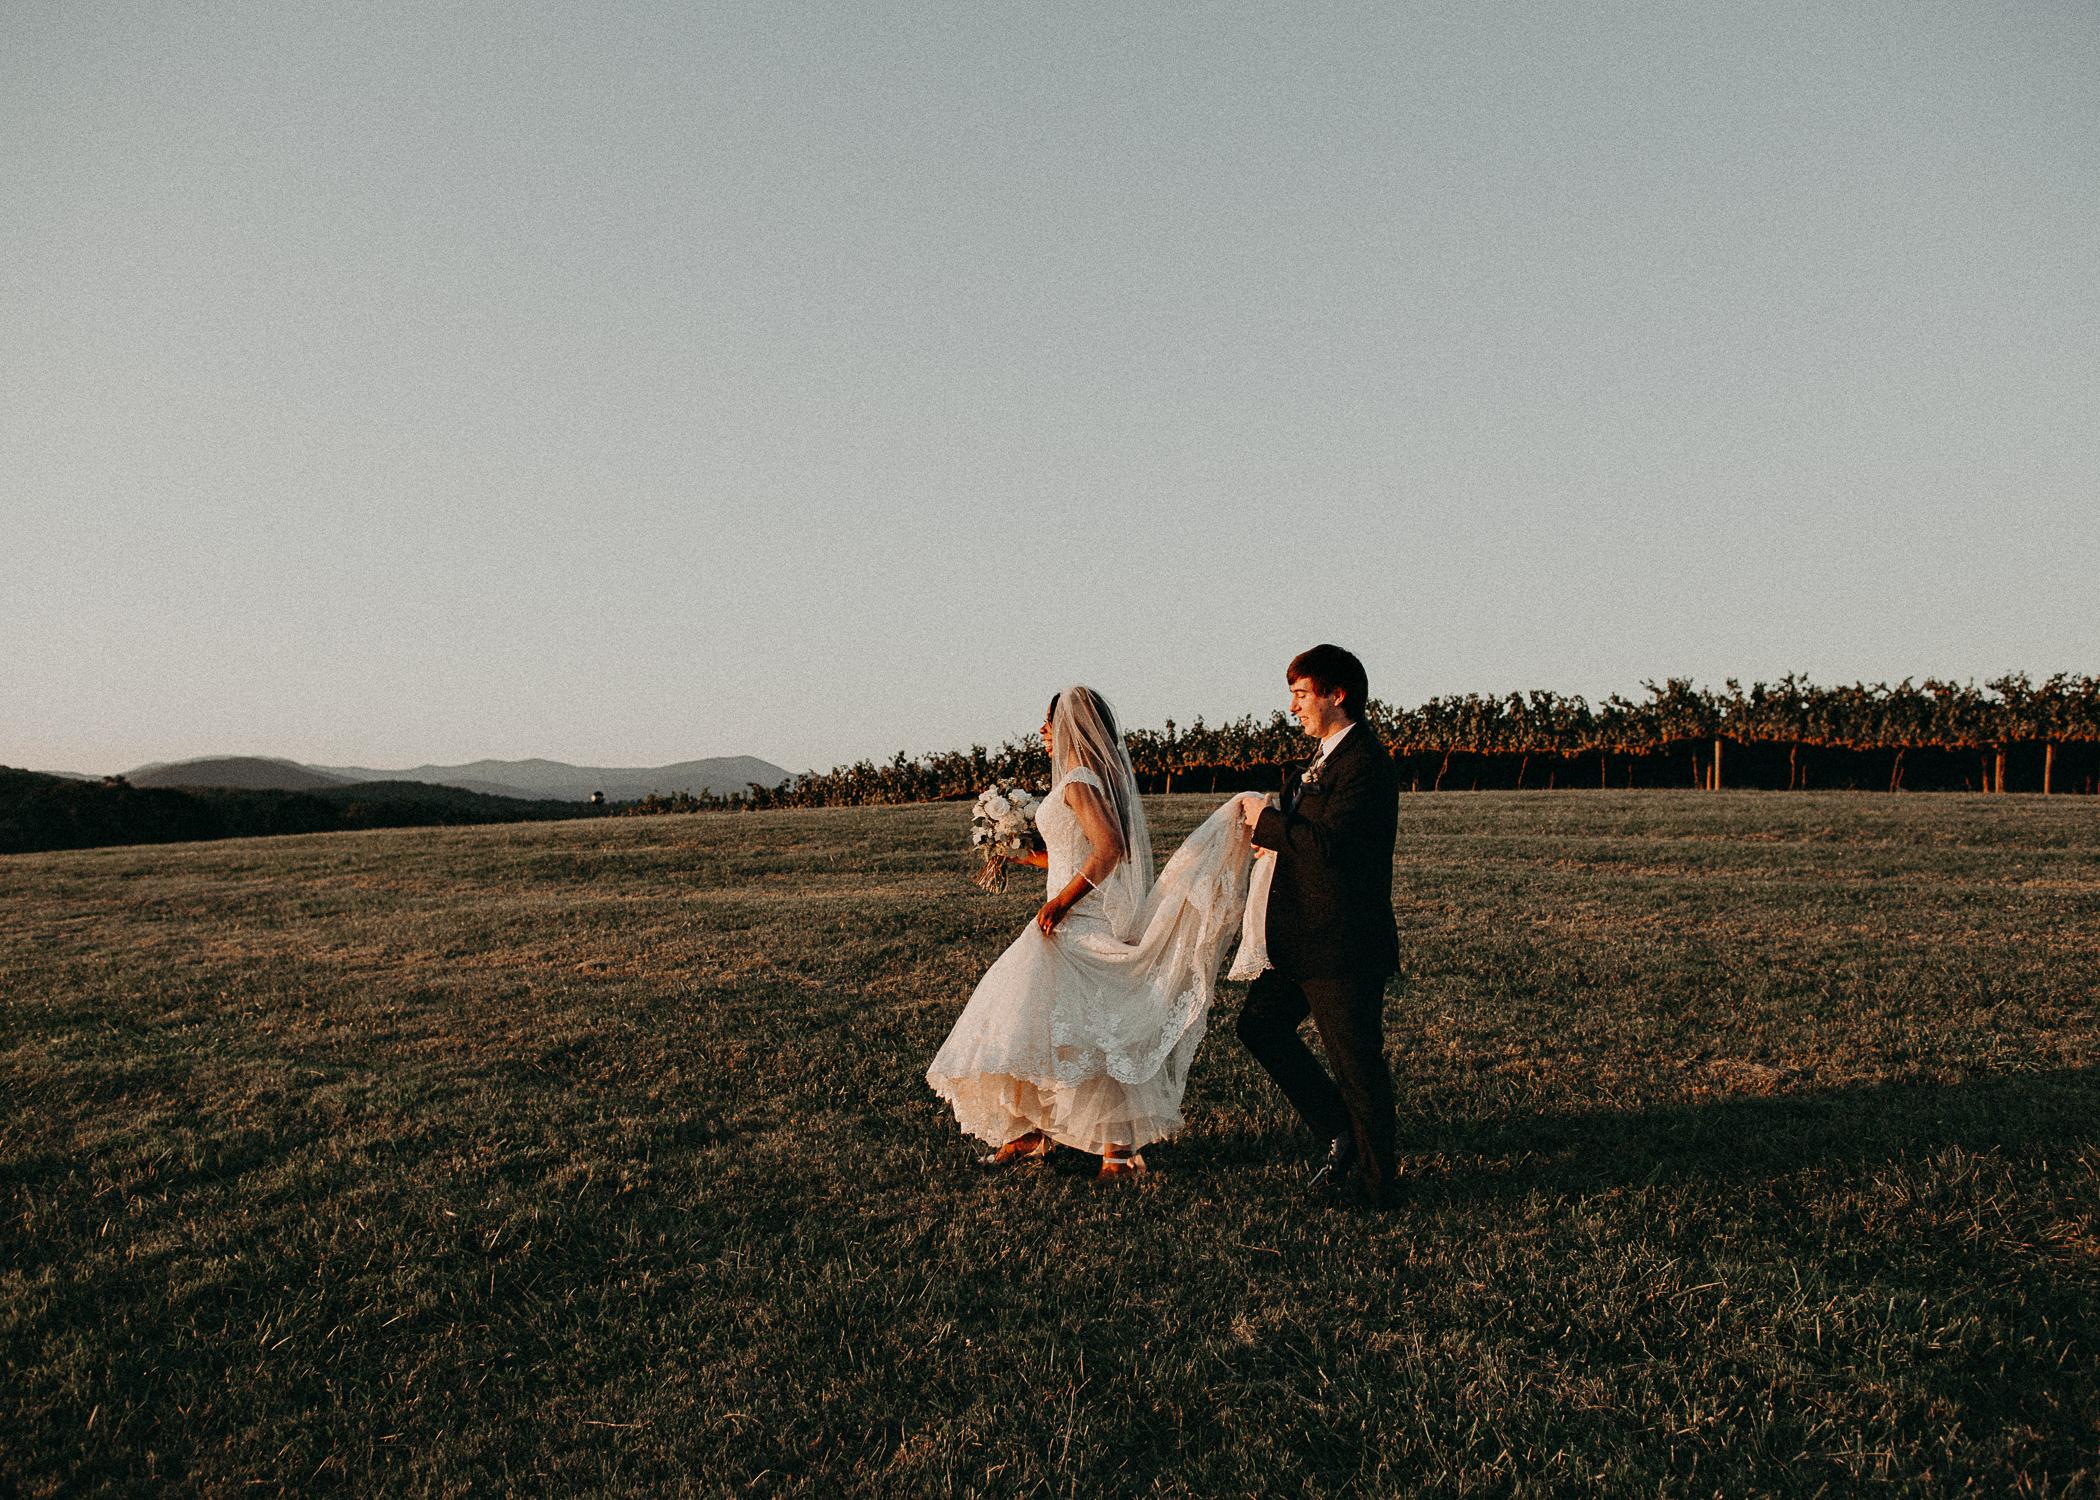 74- Kaya_vineyard_dahlonega_wedding_venue_bride_and_groom_sunset_pictures_aline_marin_photography.jpg